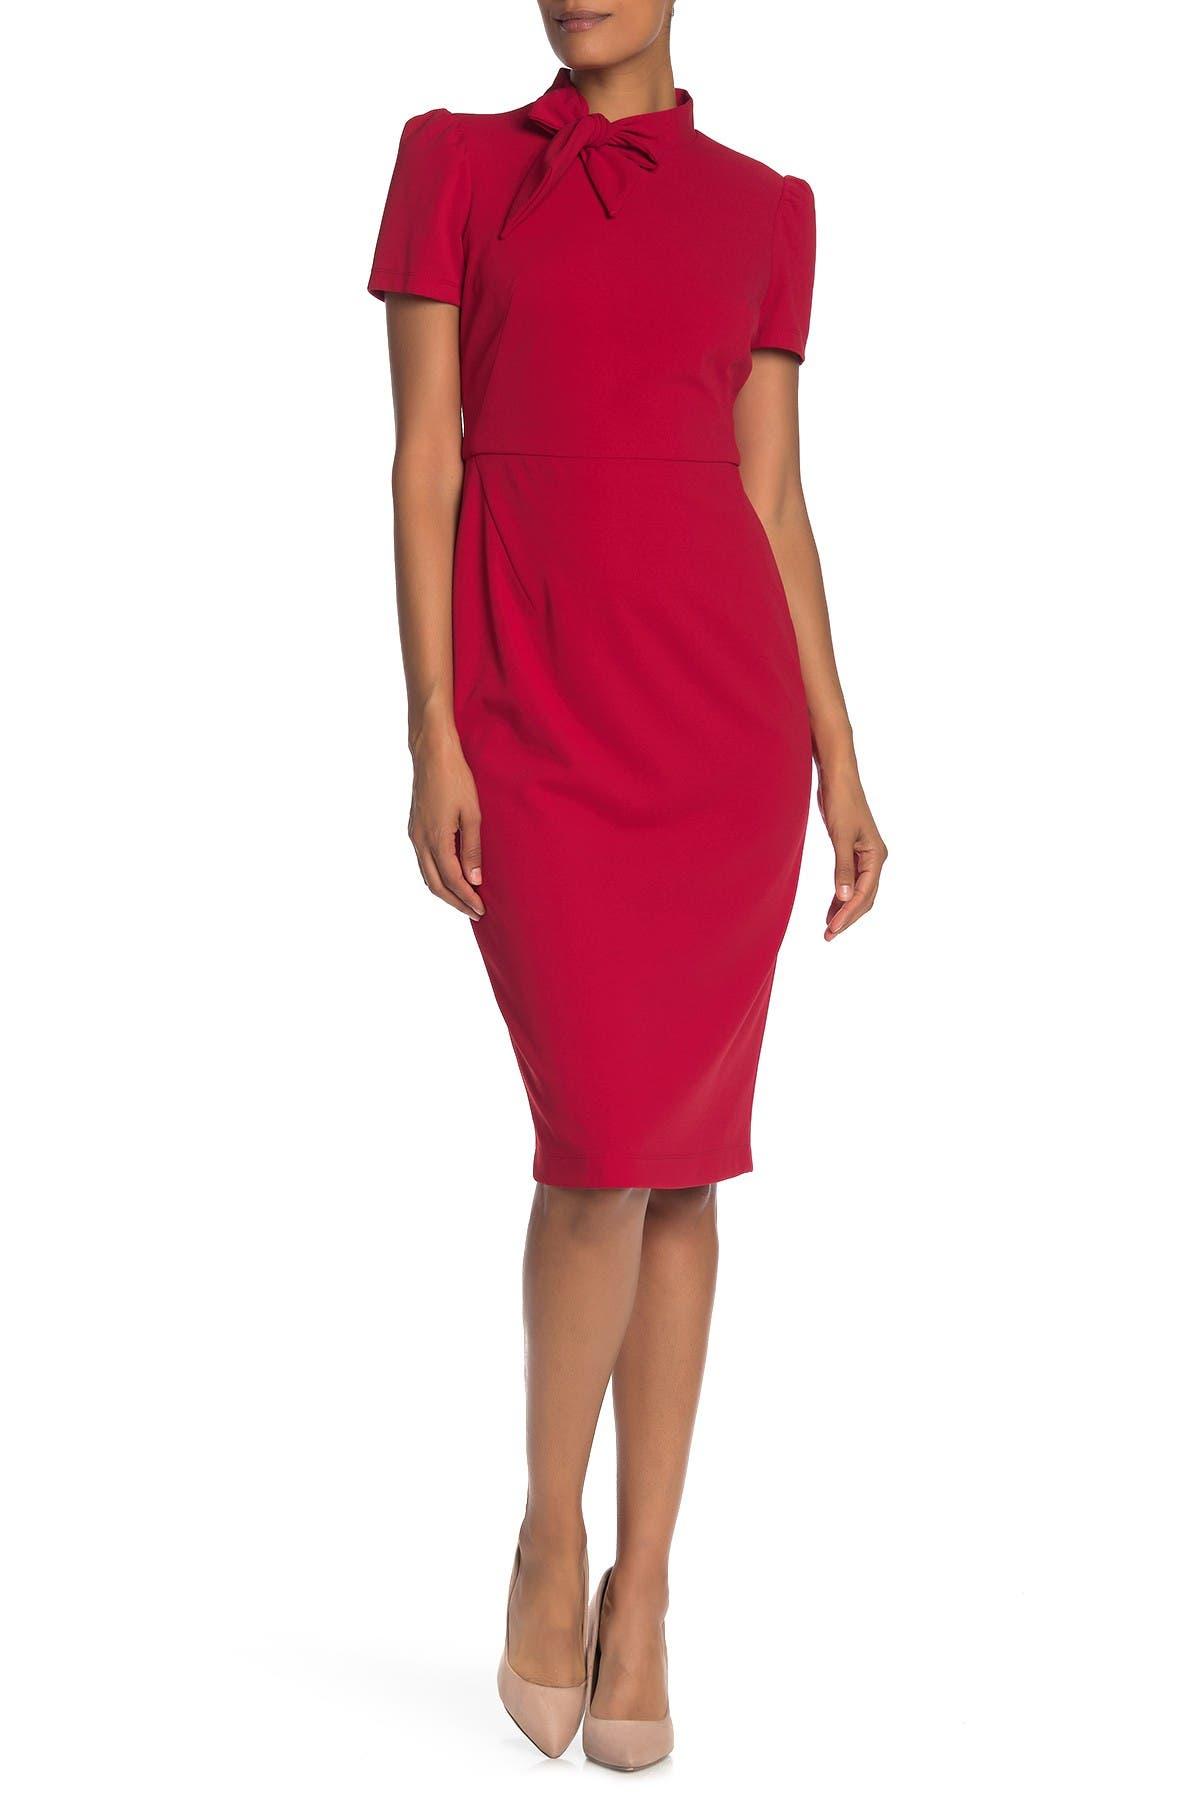 Image of Maggy London Tie Neck Short Sleeve Crepe Sheath Dress